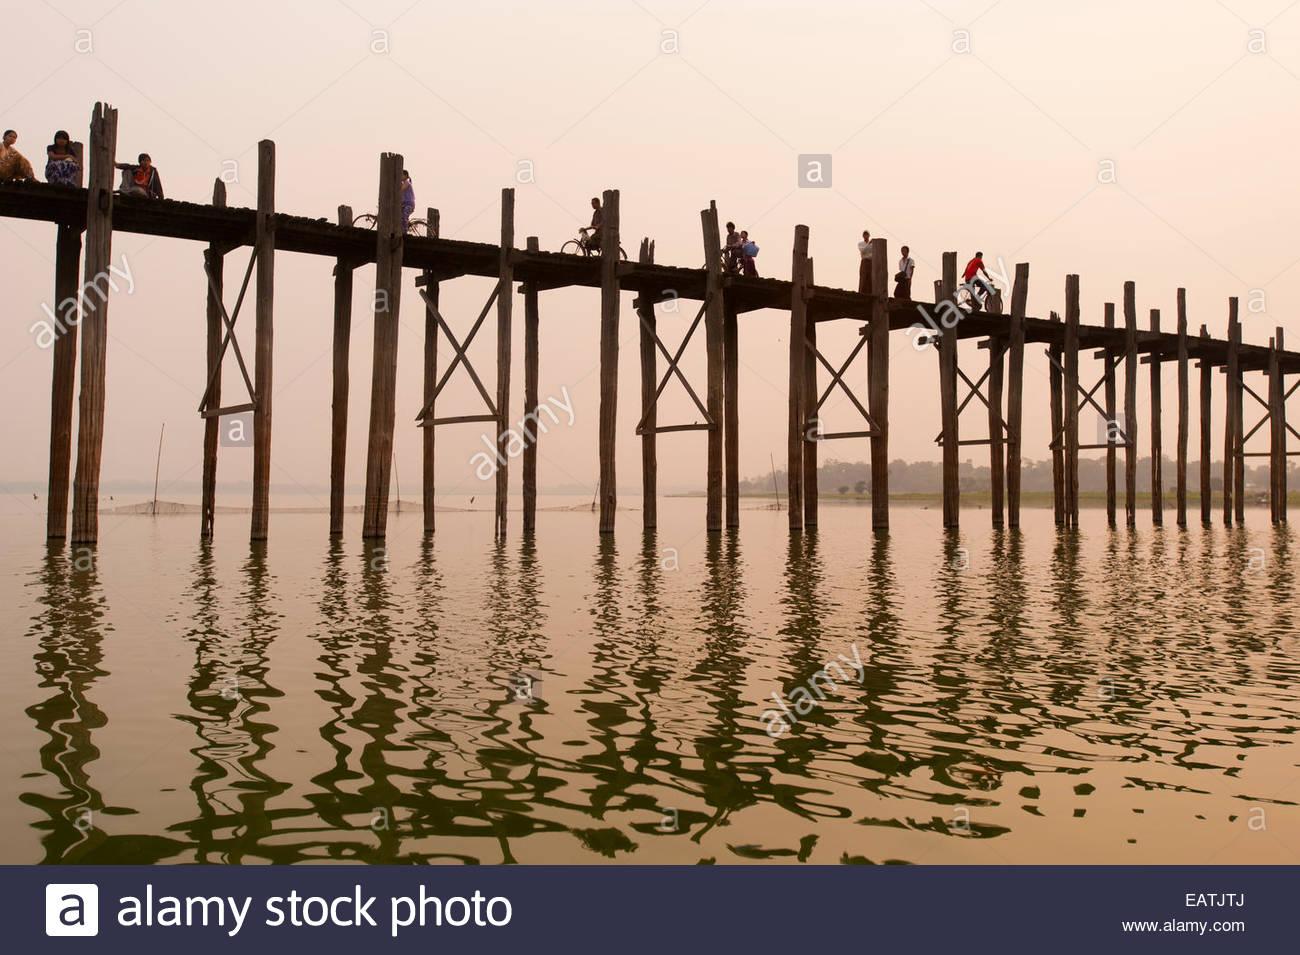 The 1.2 km wooden footbridge is the longest teak bridge in the world. - Stock Image